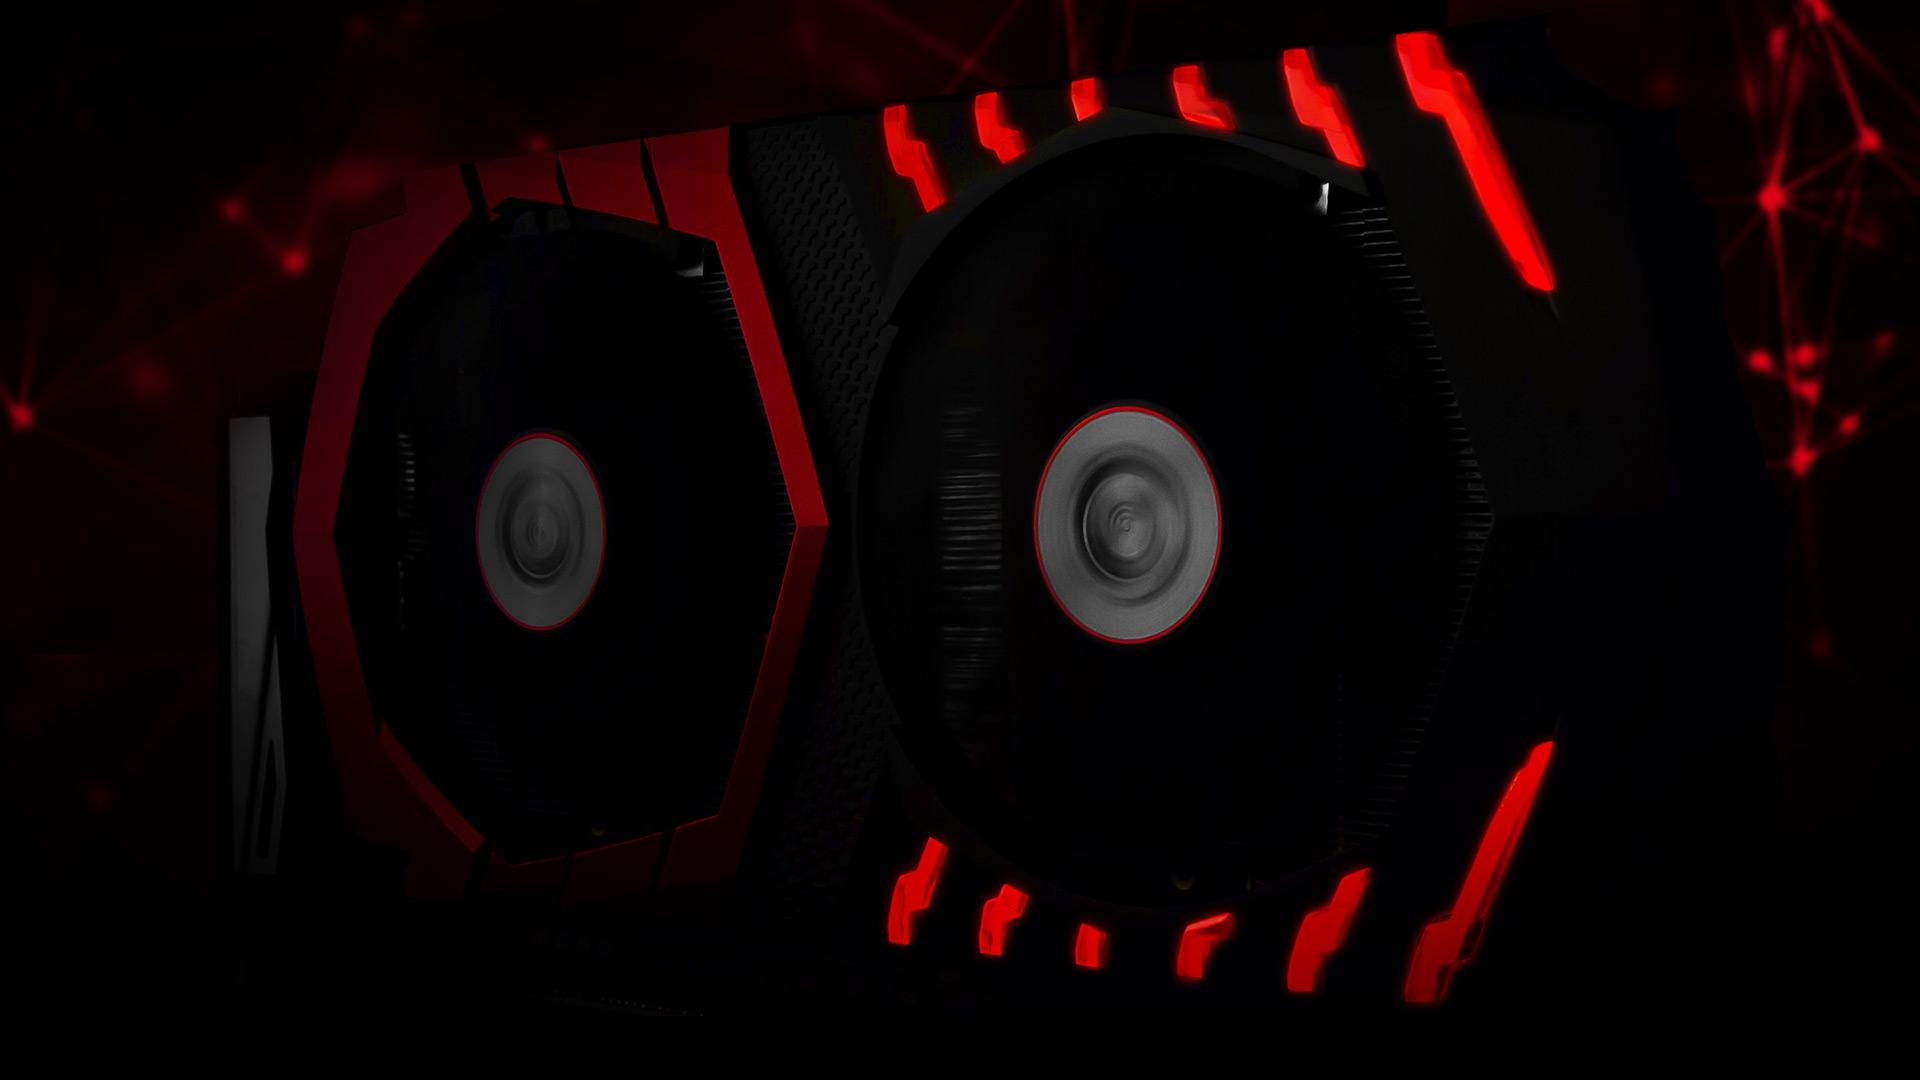 NVIDIA GeForce GTX 1080 Ti Custom Model Roundup ASUS ROG STRIX MSI Gaming X ZOTAC AMP Extreme EVGA ICX FTW3 GALAX HOF And More